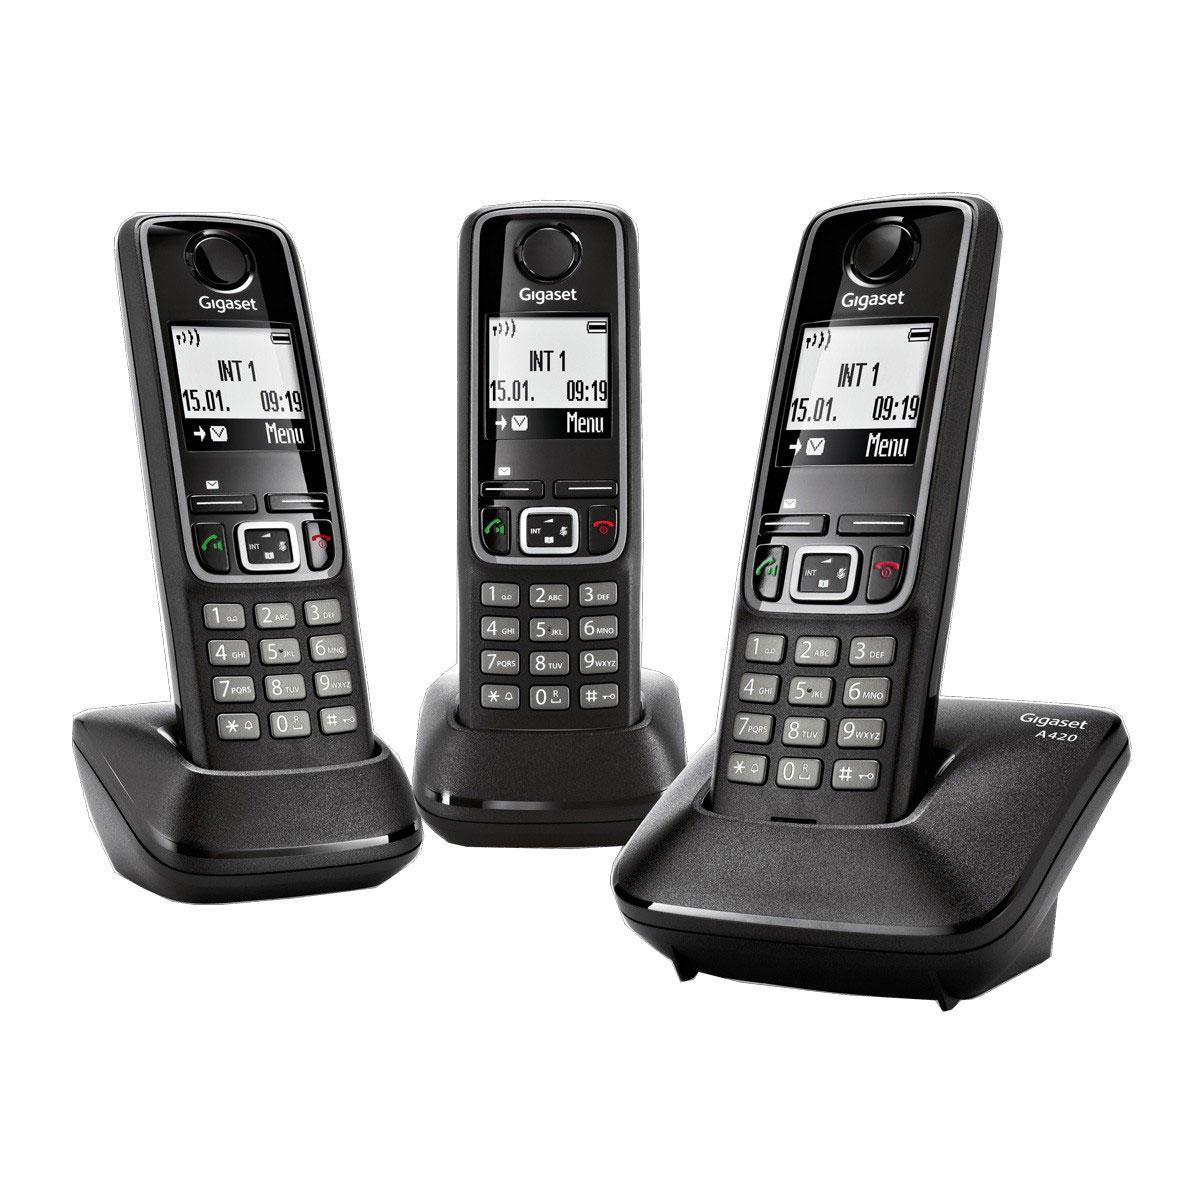 gigaset a420 trio noir t l phone sans fil gigaset sur. Black Bedroom Furniture Sets. Home Design Ideas